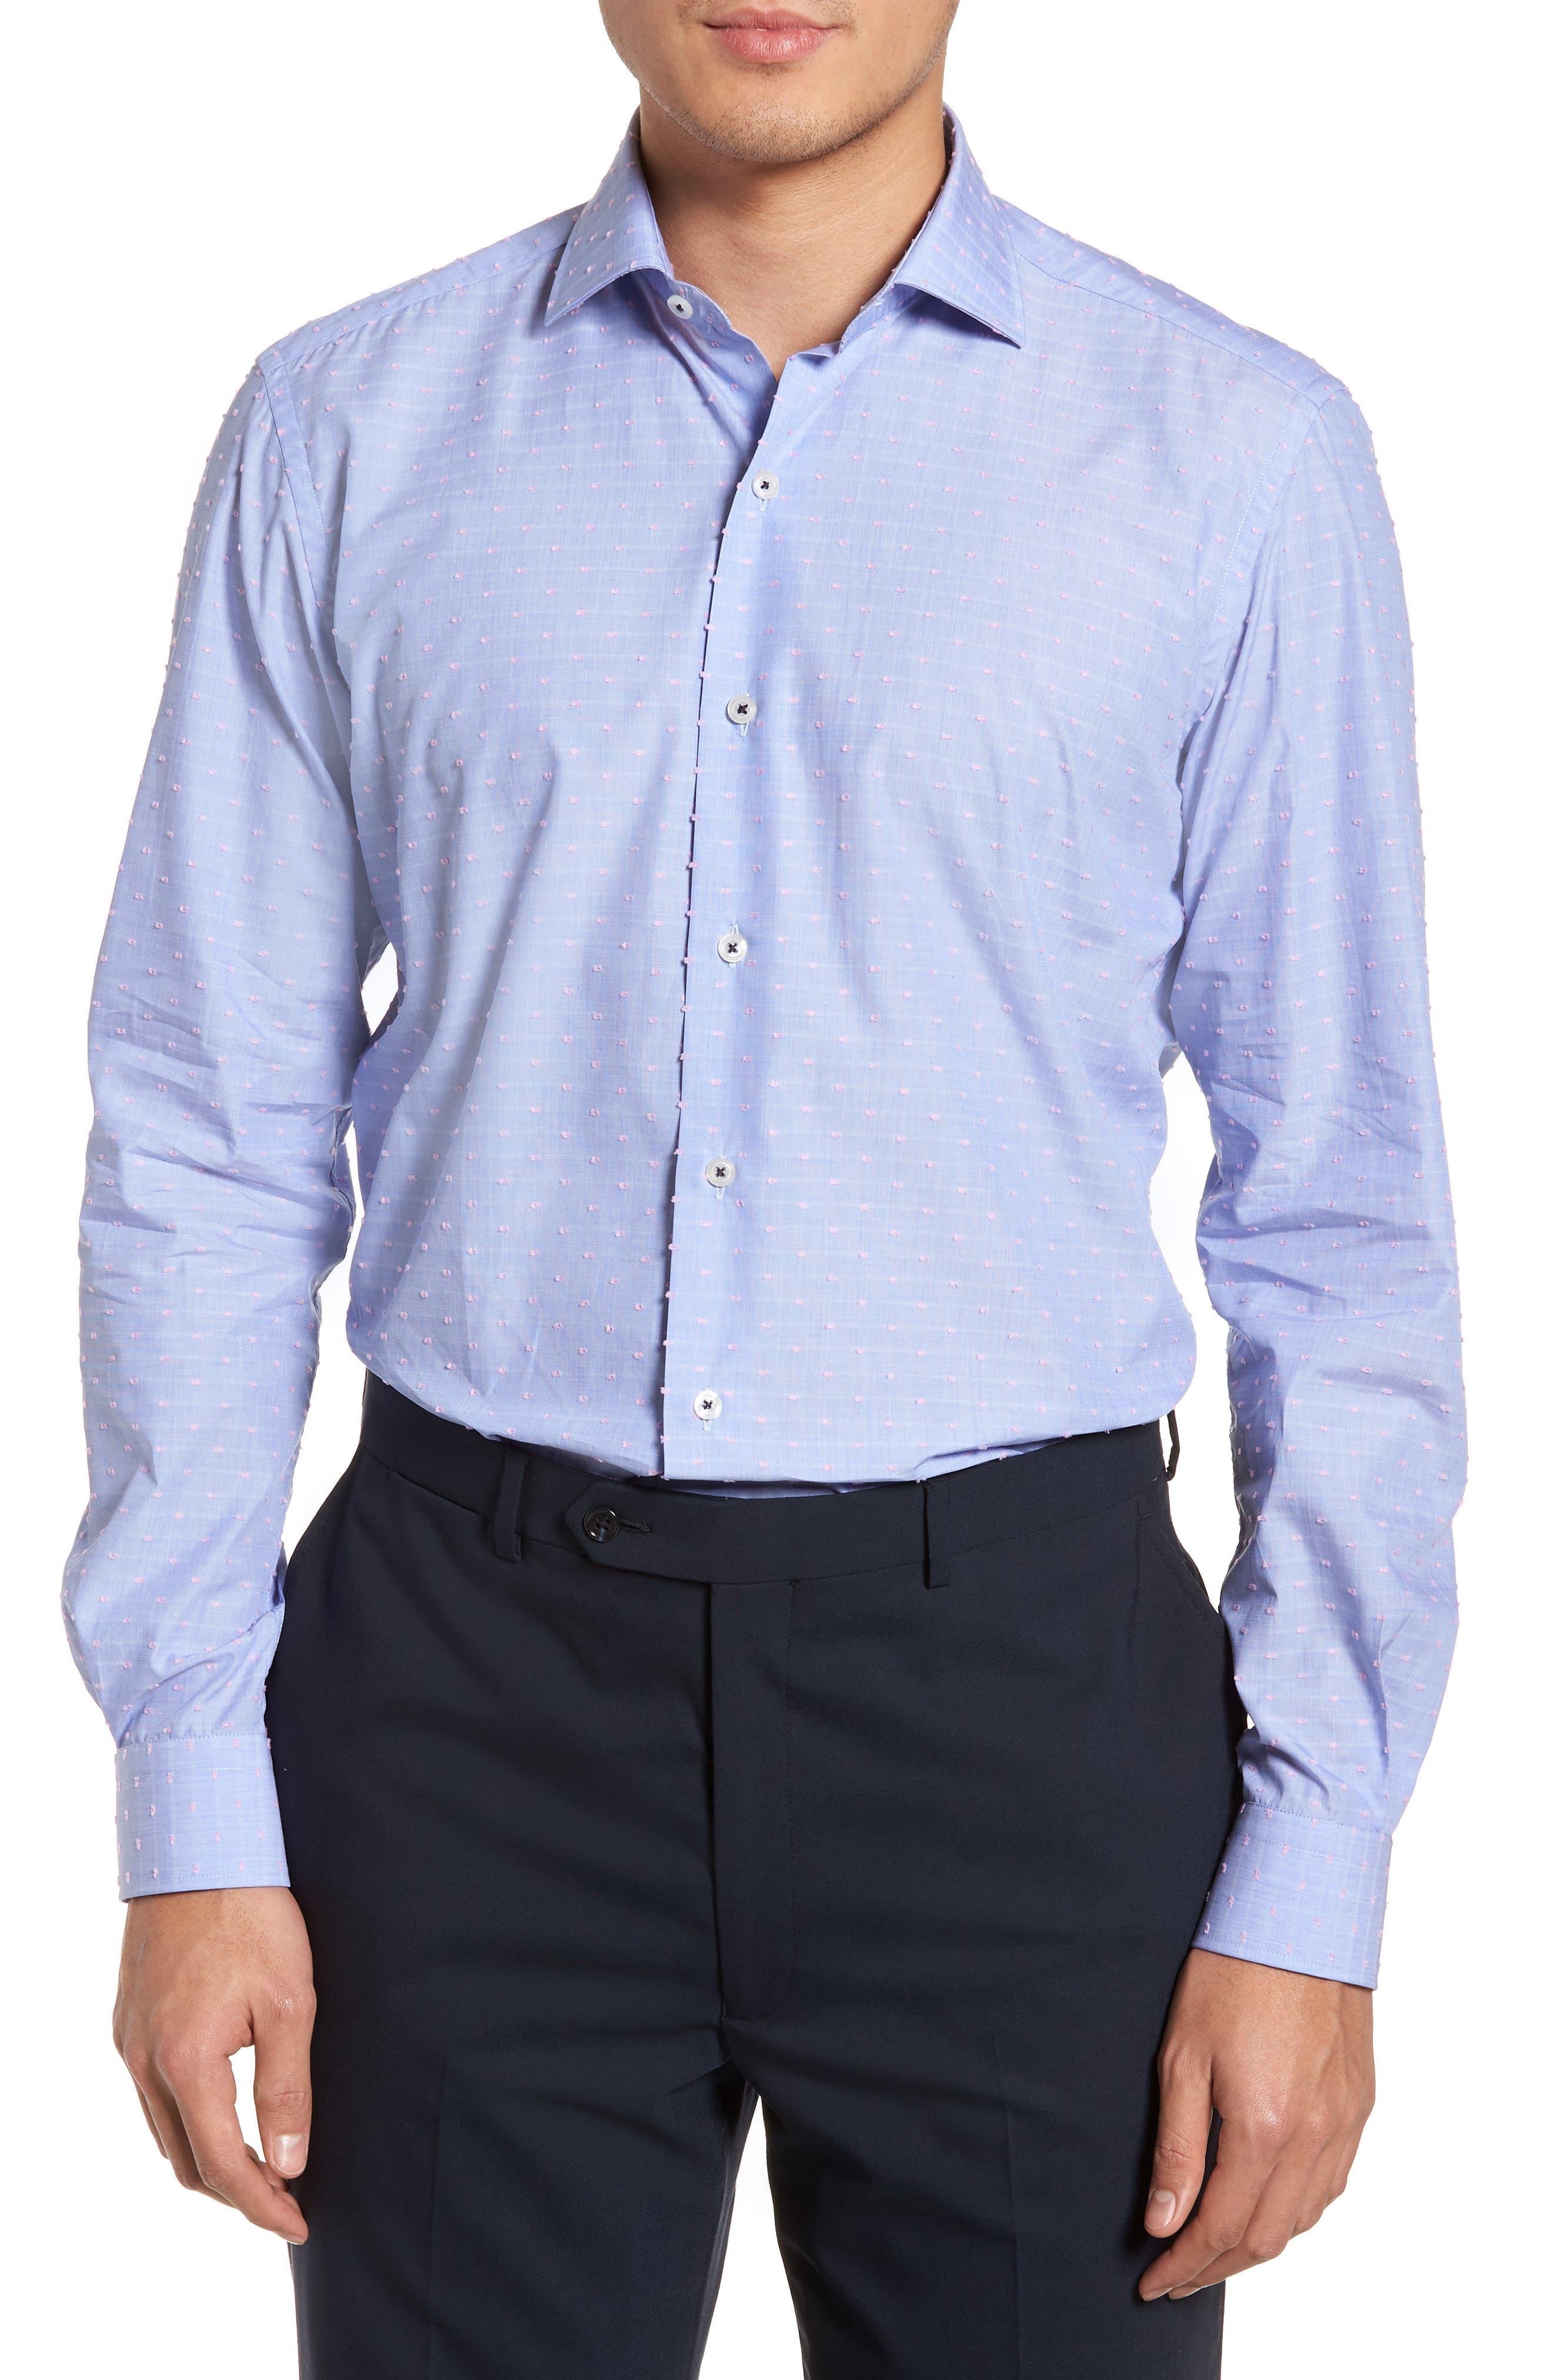 Main Image - Culturata Tailored Fit Soft Touch Fil Coupé Sport Shirt